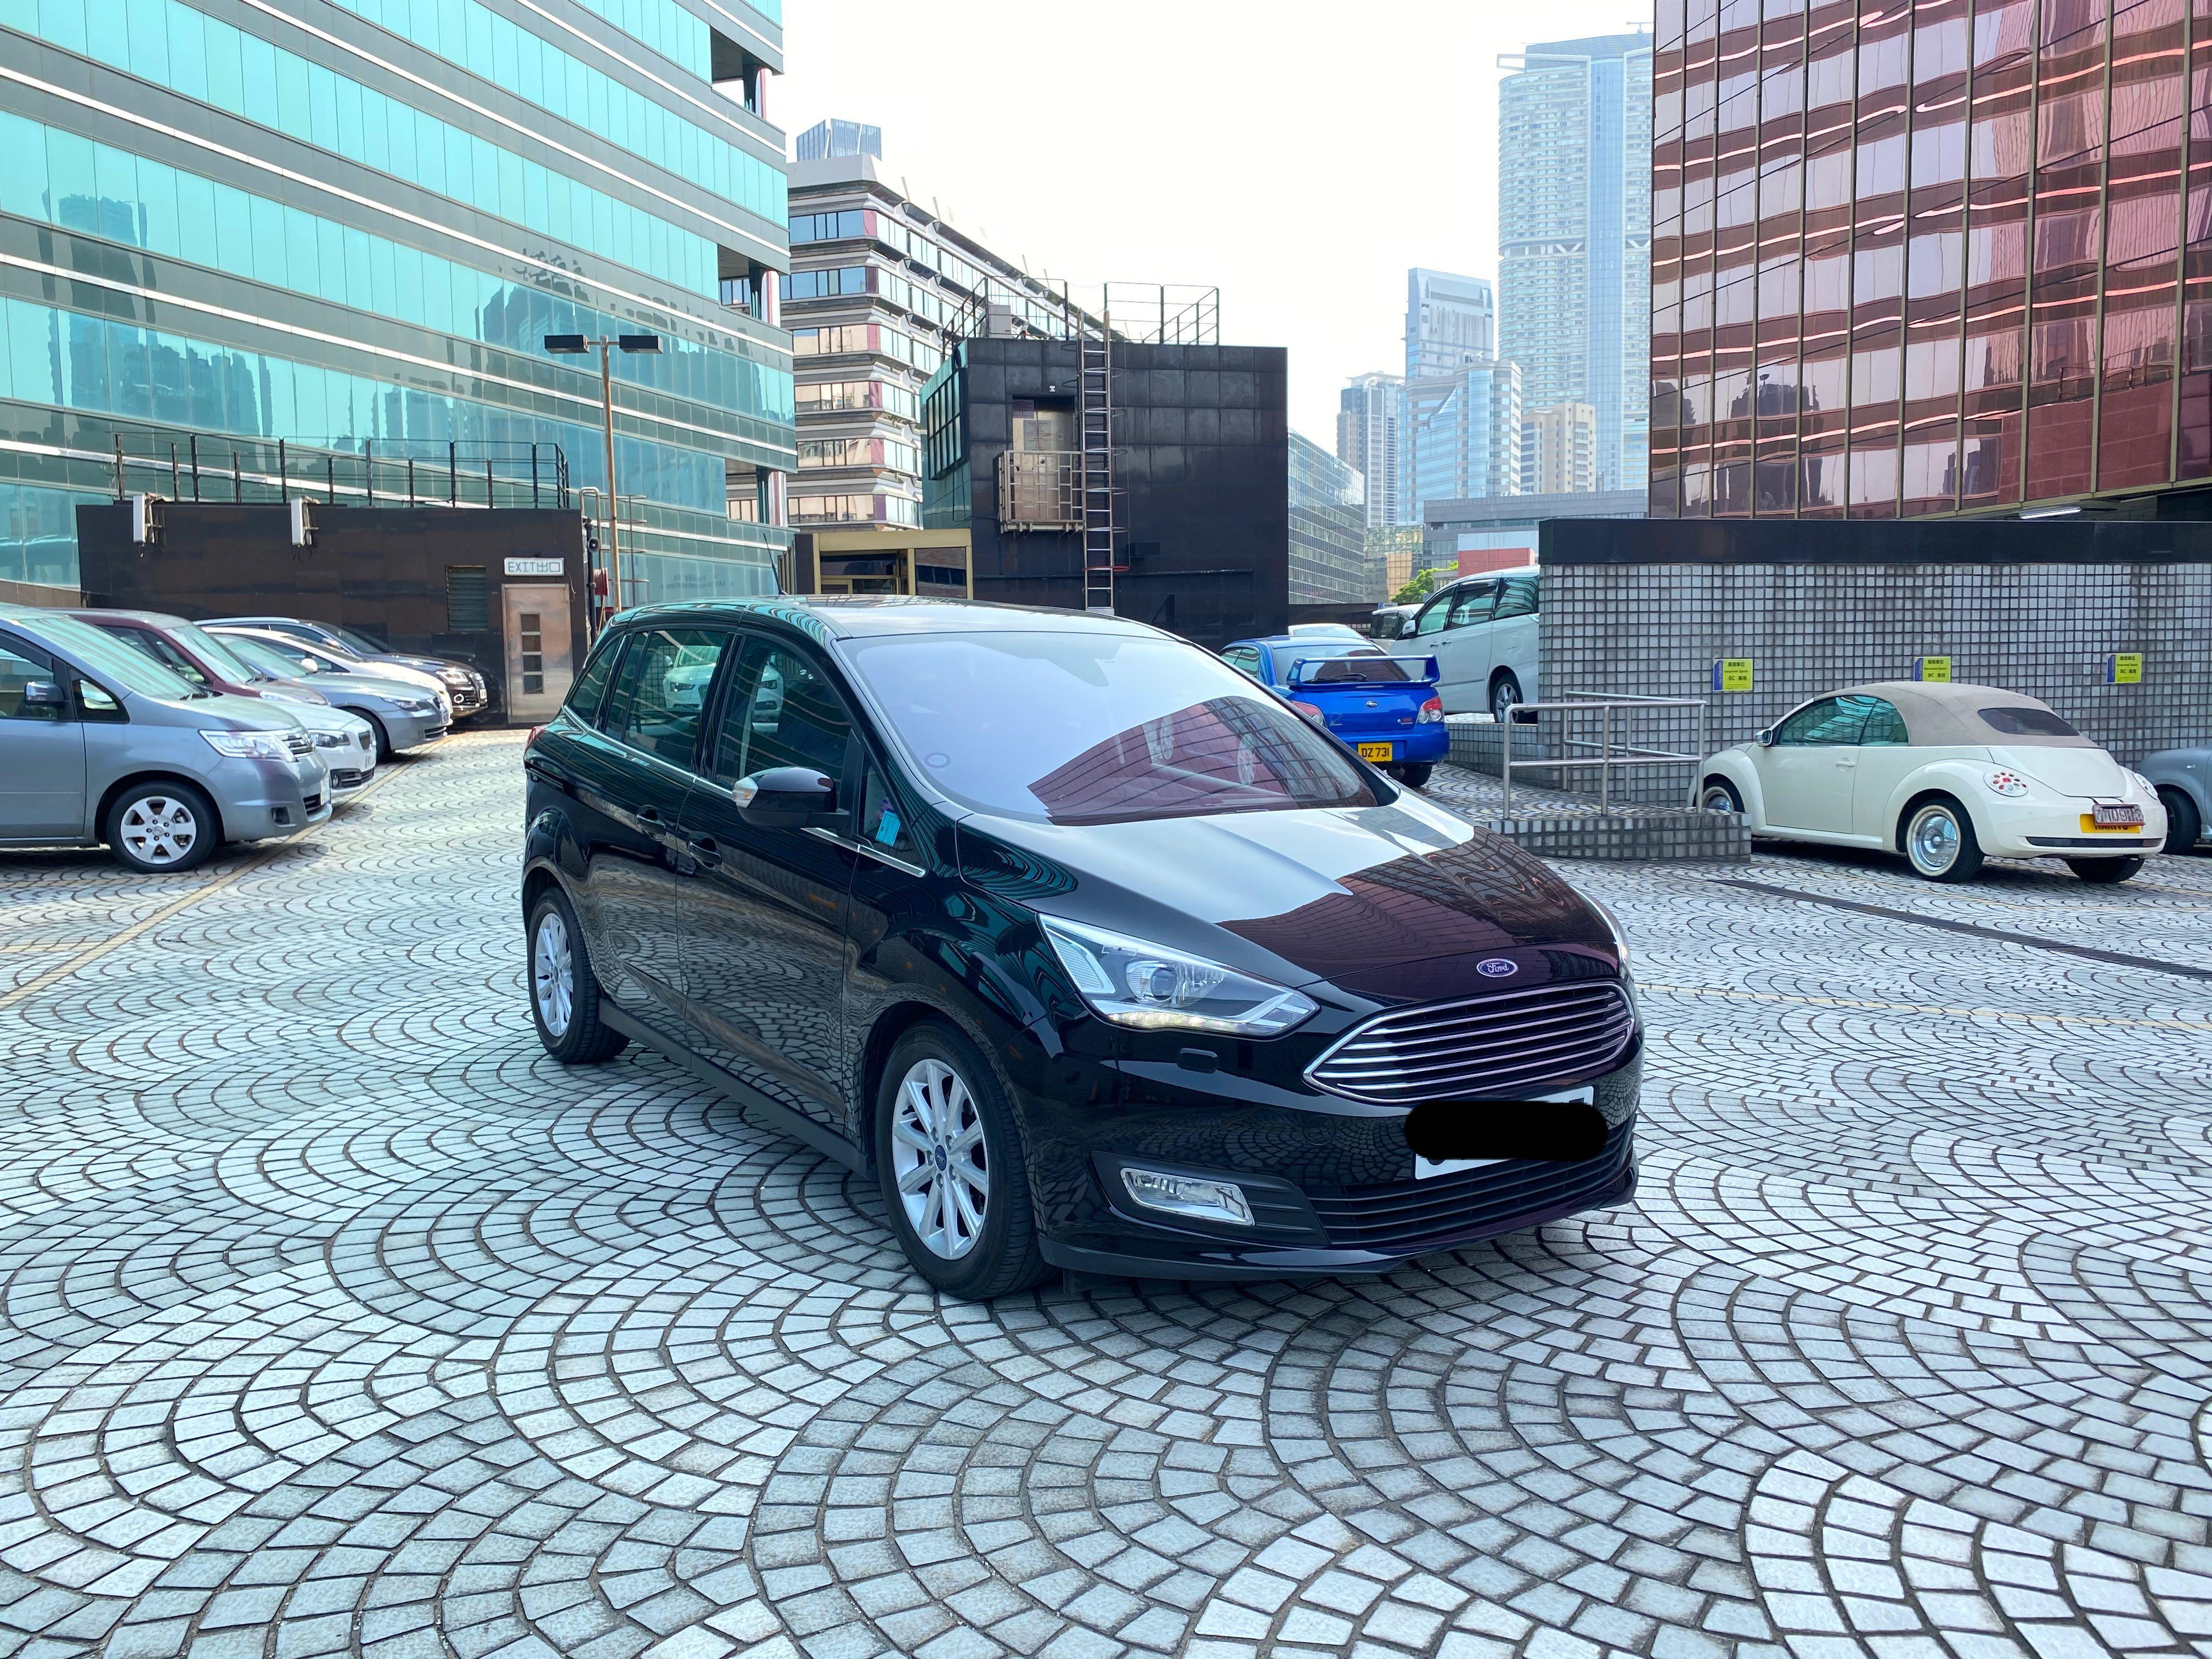 Ford Grand C-Max 1.5 1.5 Titanium EcoBoost (A)